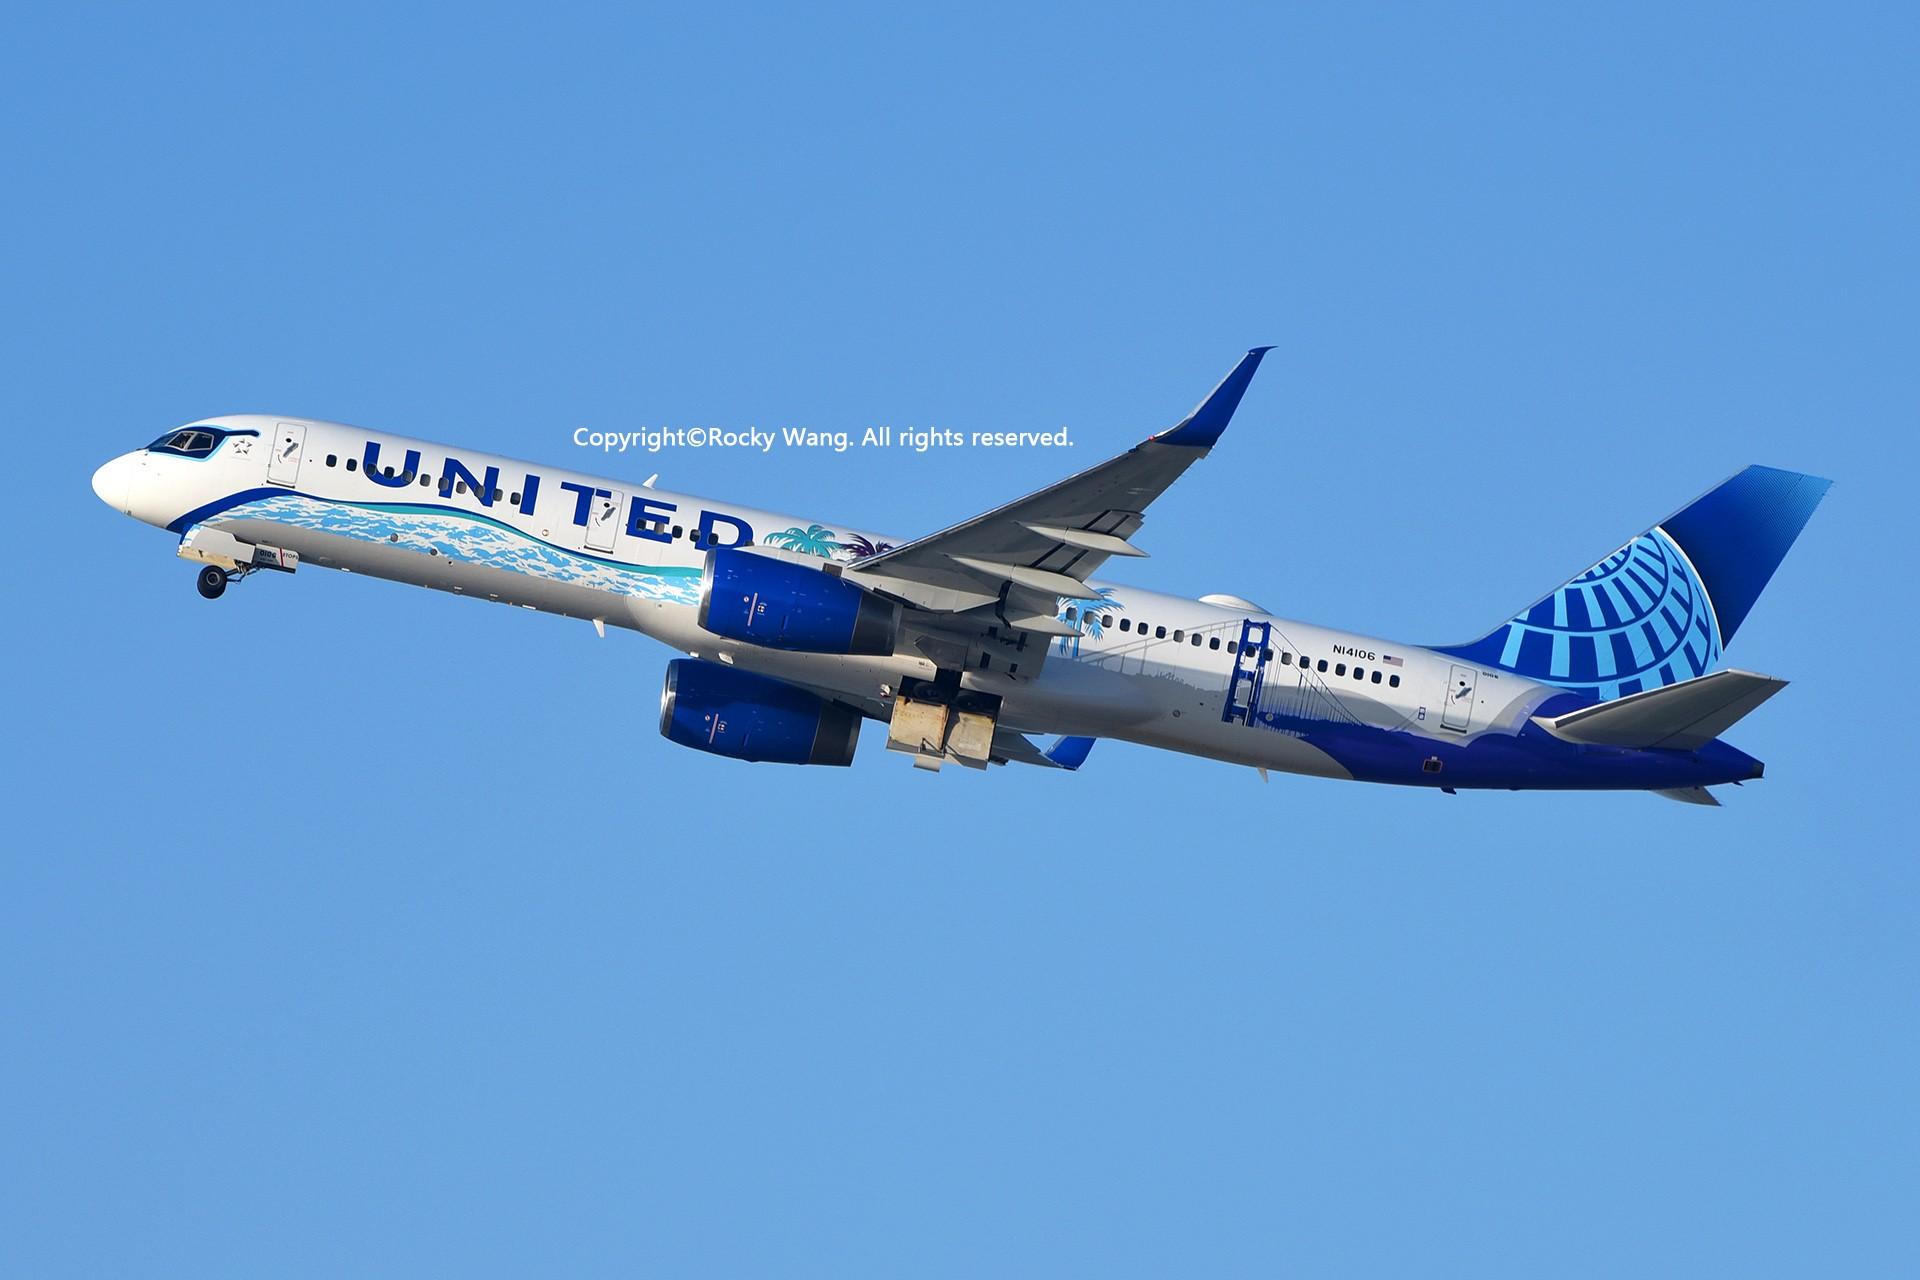 Re:[原创]彩绘圣地-附加彩蛋 BOEING 757-224 N14106 Los Angeles Int'l Airport